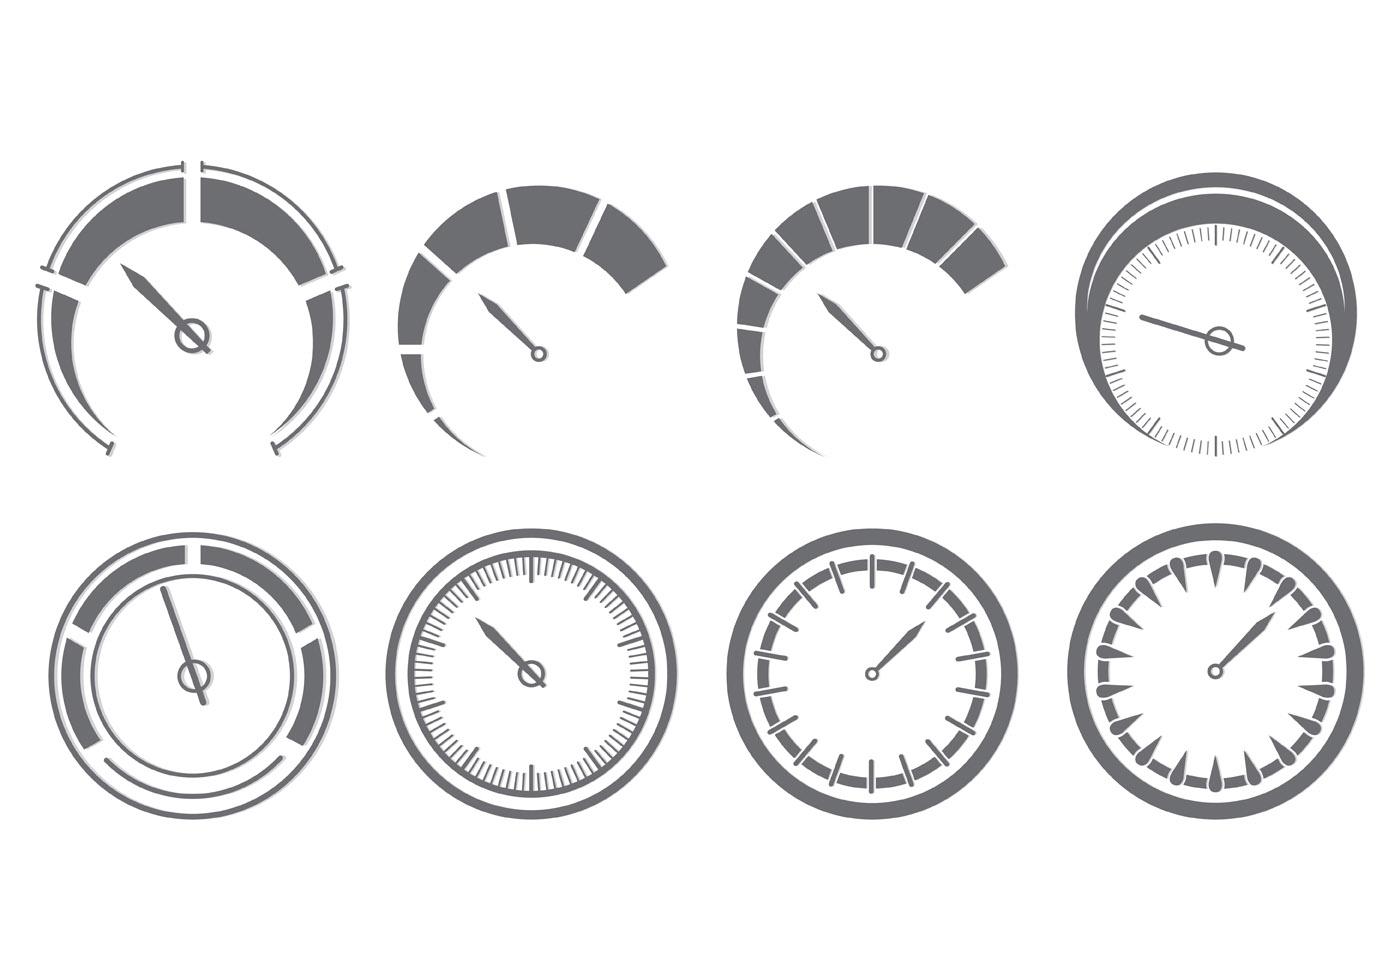 set of tachometer icons